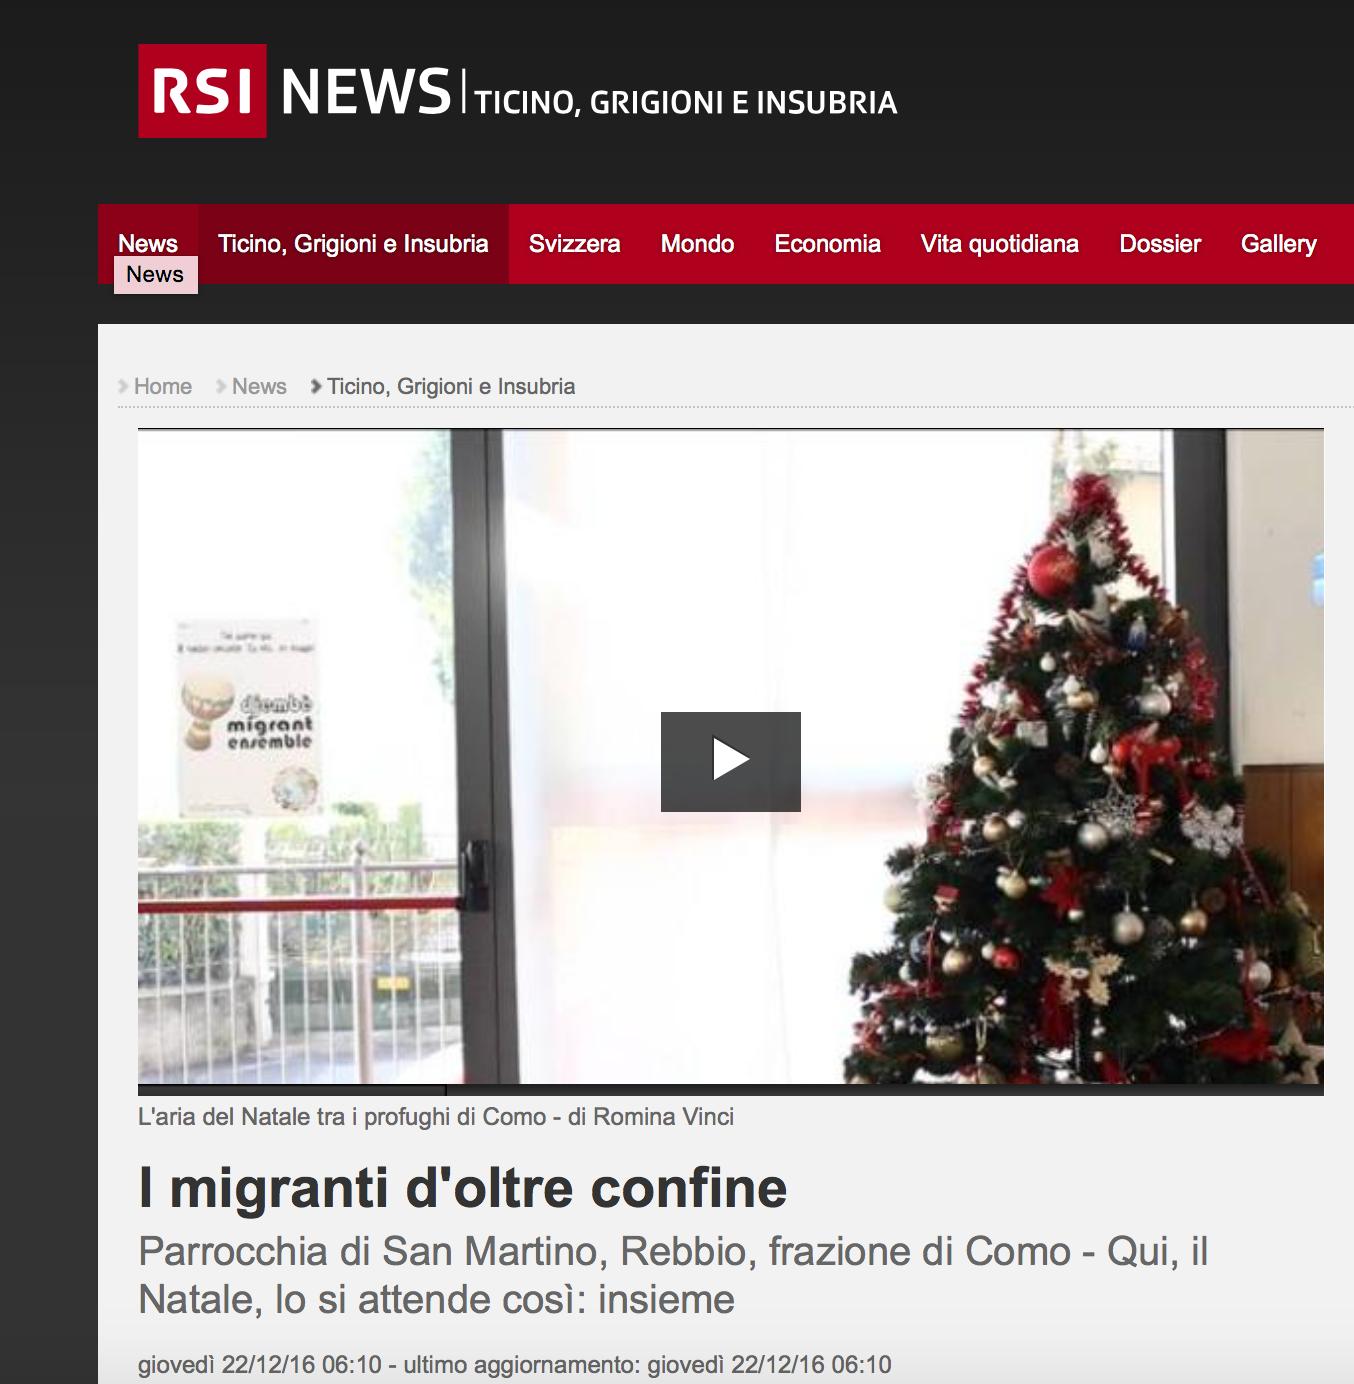 RSI - Radio Televisione Svizzera - December 2016